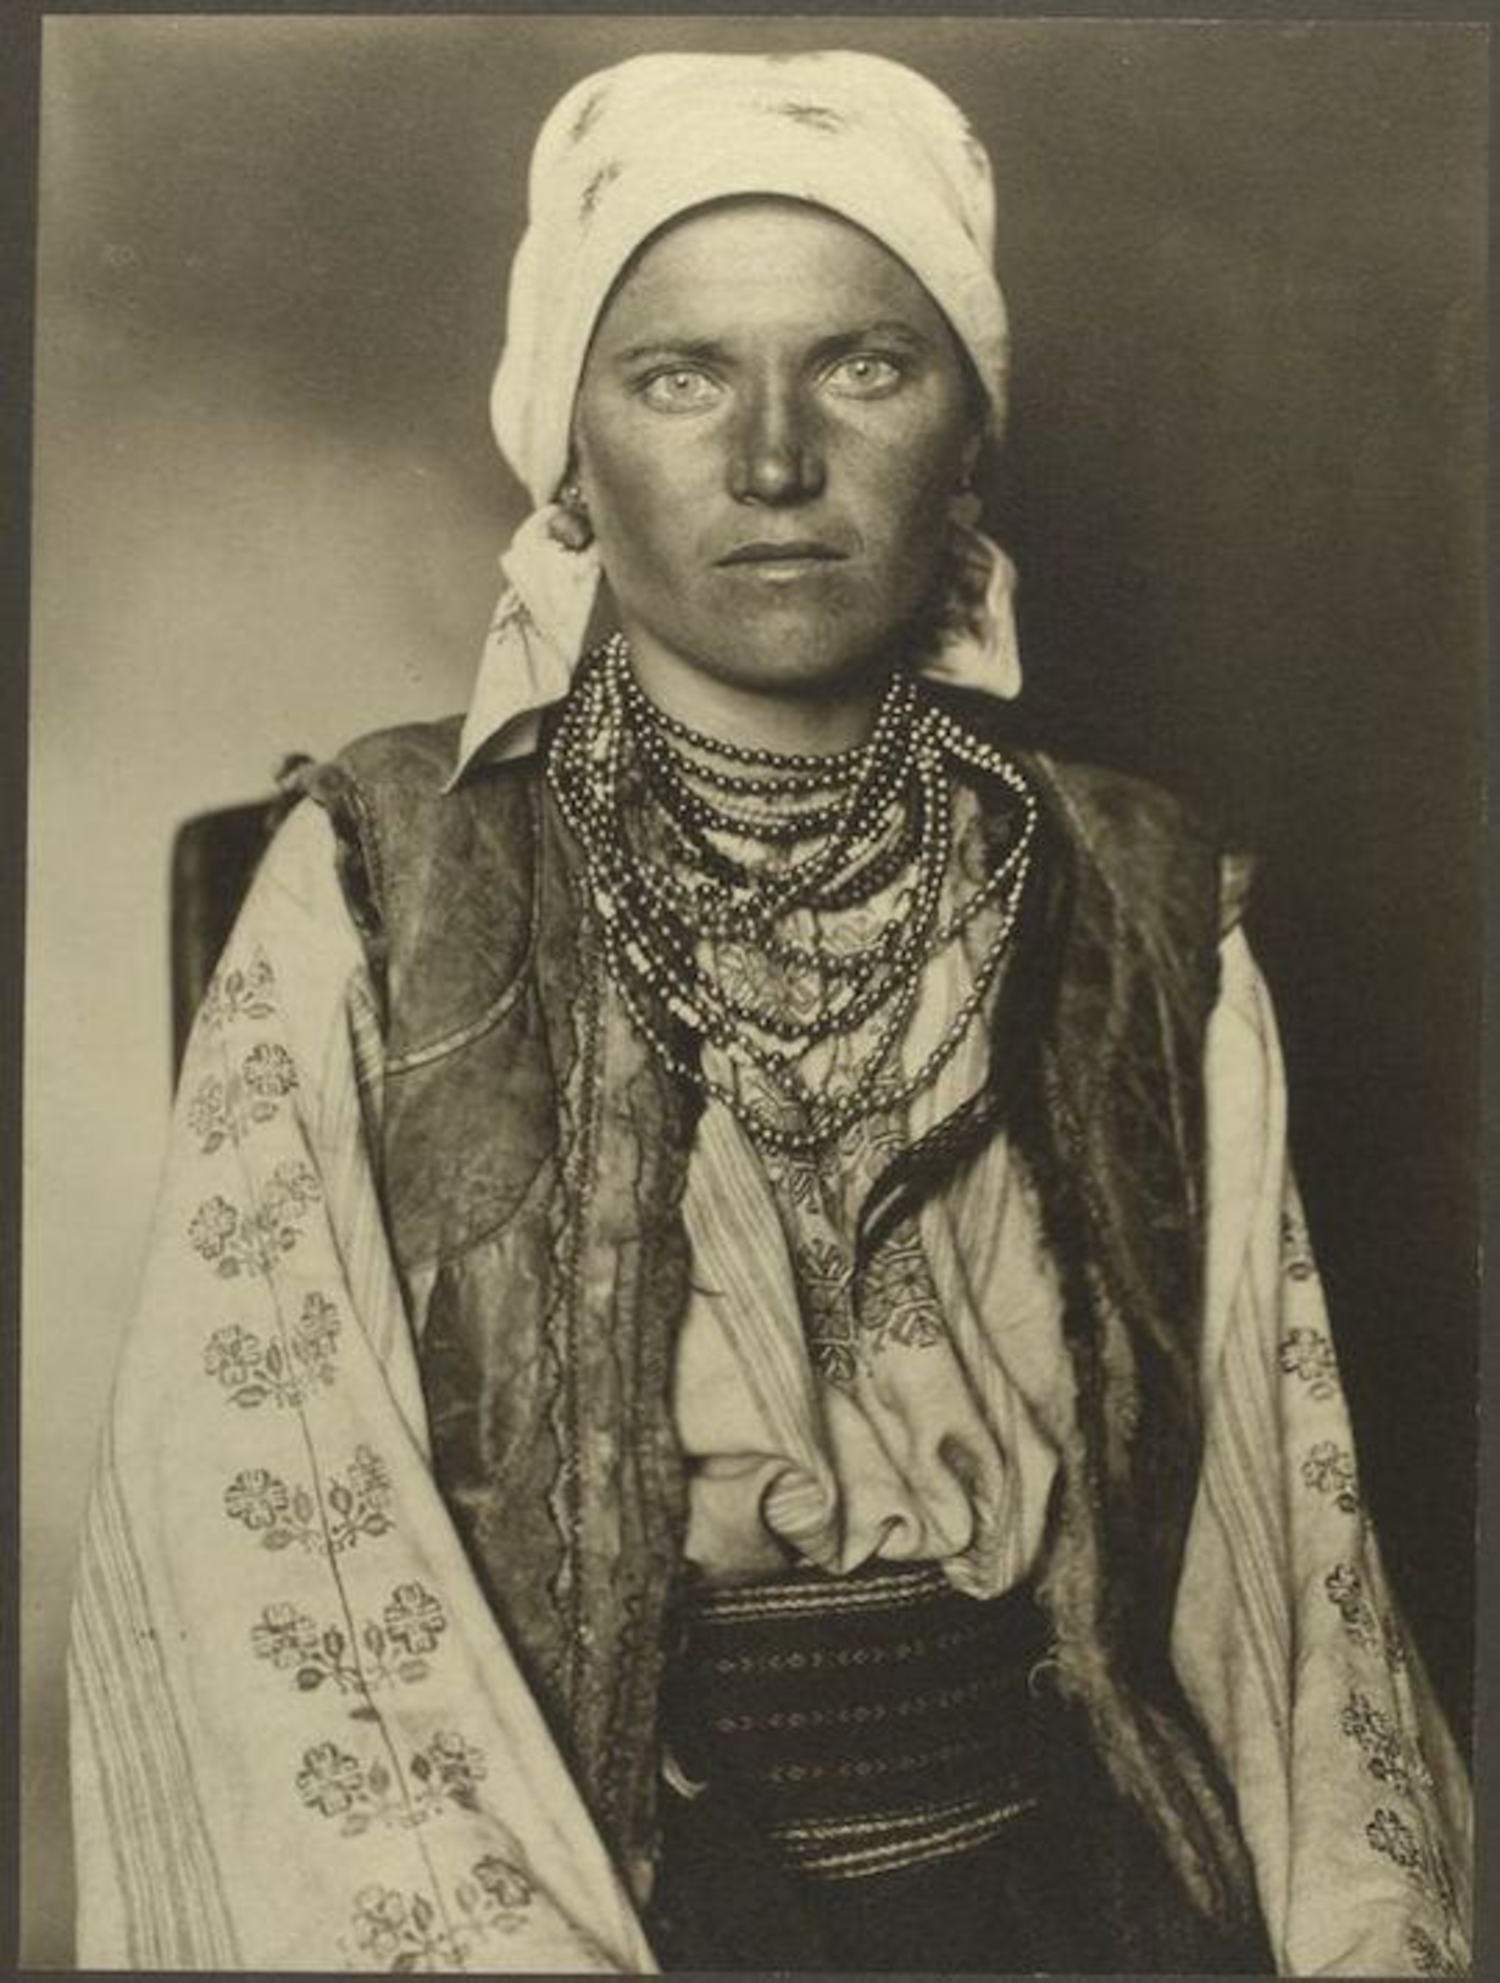 A Ruthenian woman. Portraits for Ellis Island.